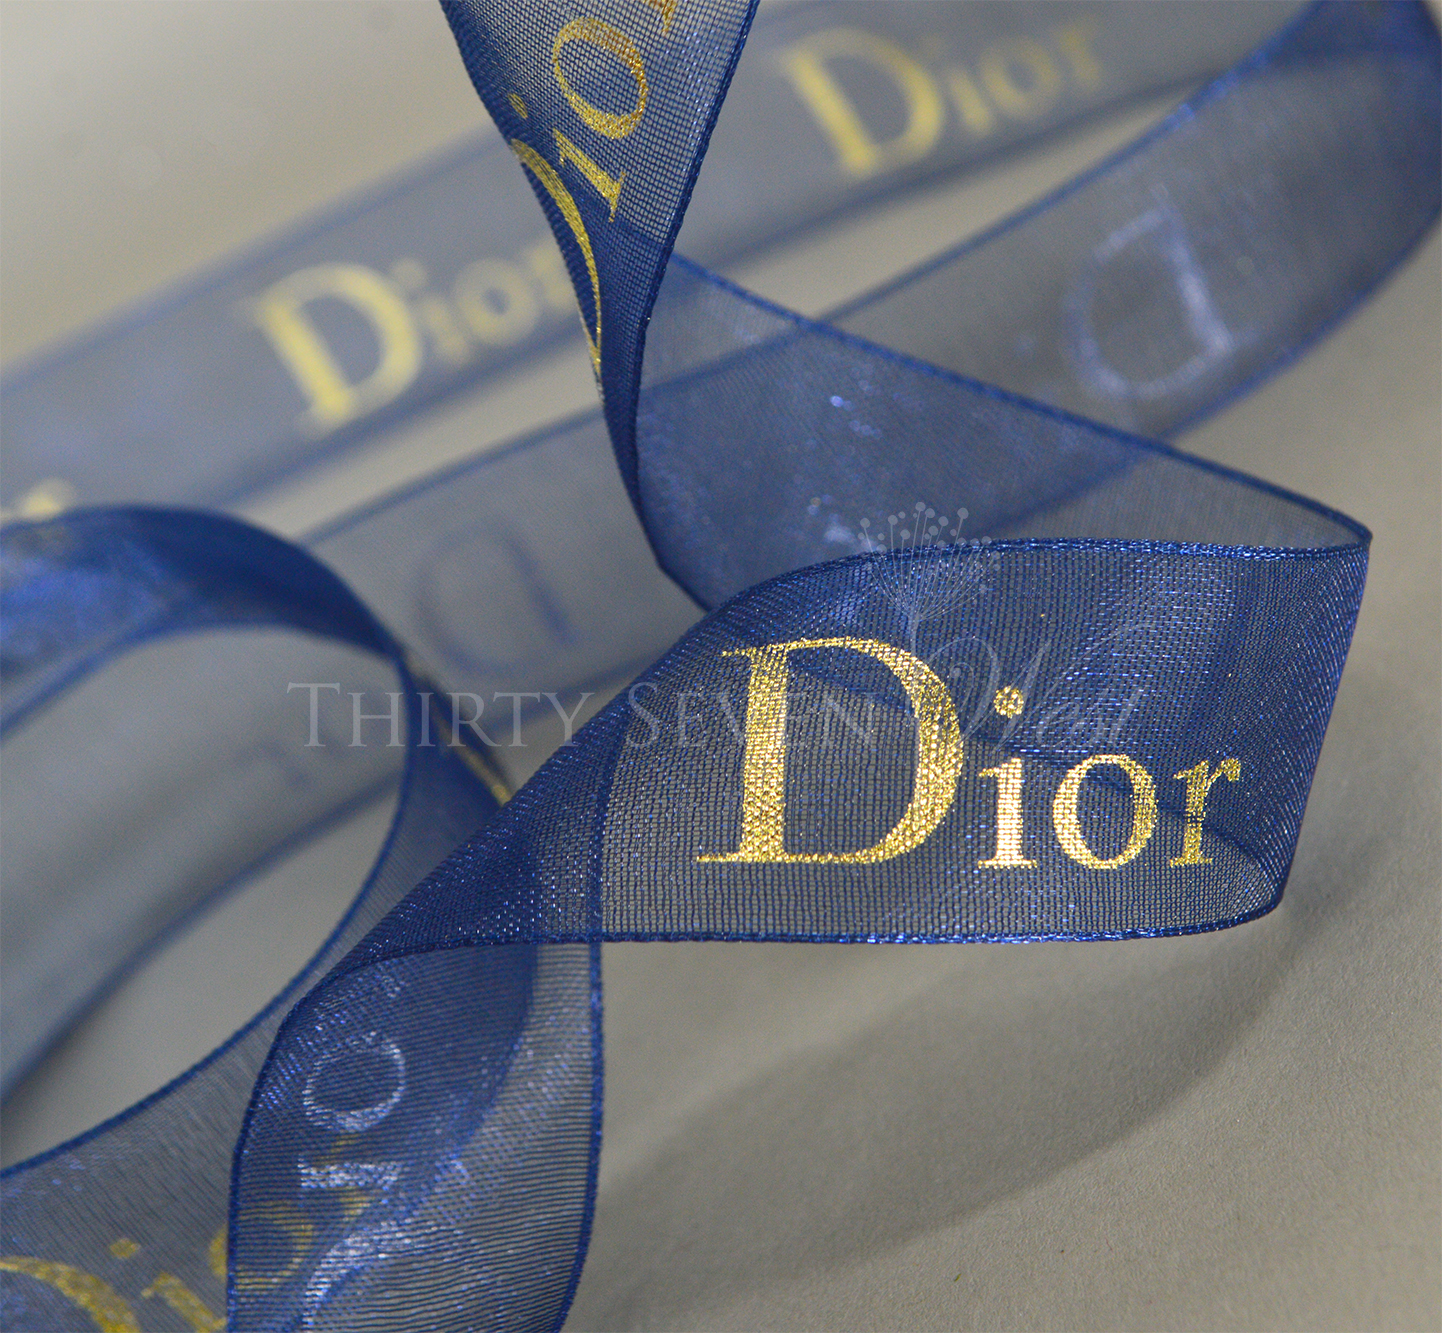 Blue Organza Ribbon, Logo Ribbon, Custom Logo RIbbon, Gold Print on Organza Ribbon, Custom Ribbon, Logo on RIbbon, Luxury Ribbon for Gift Wrapping, Gift wrap, Organza Ribbon, ribbon for client gifts, ribbon for client gift